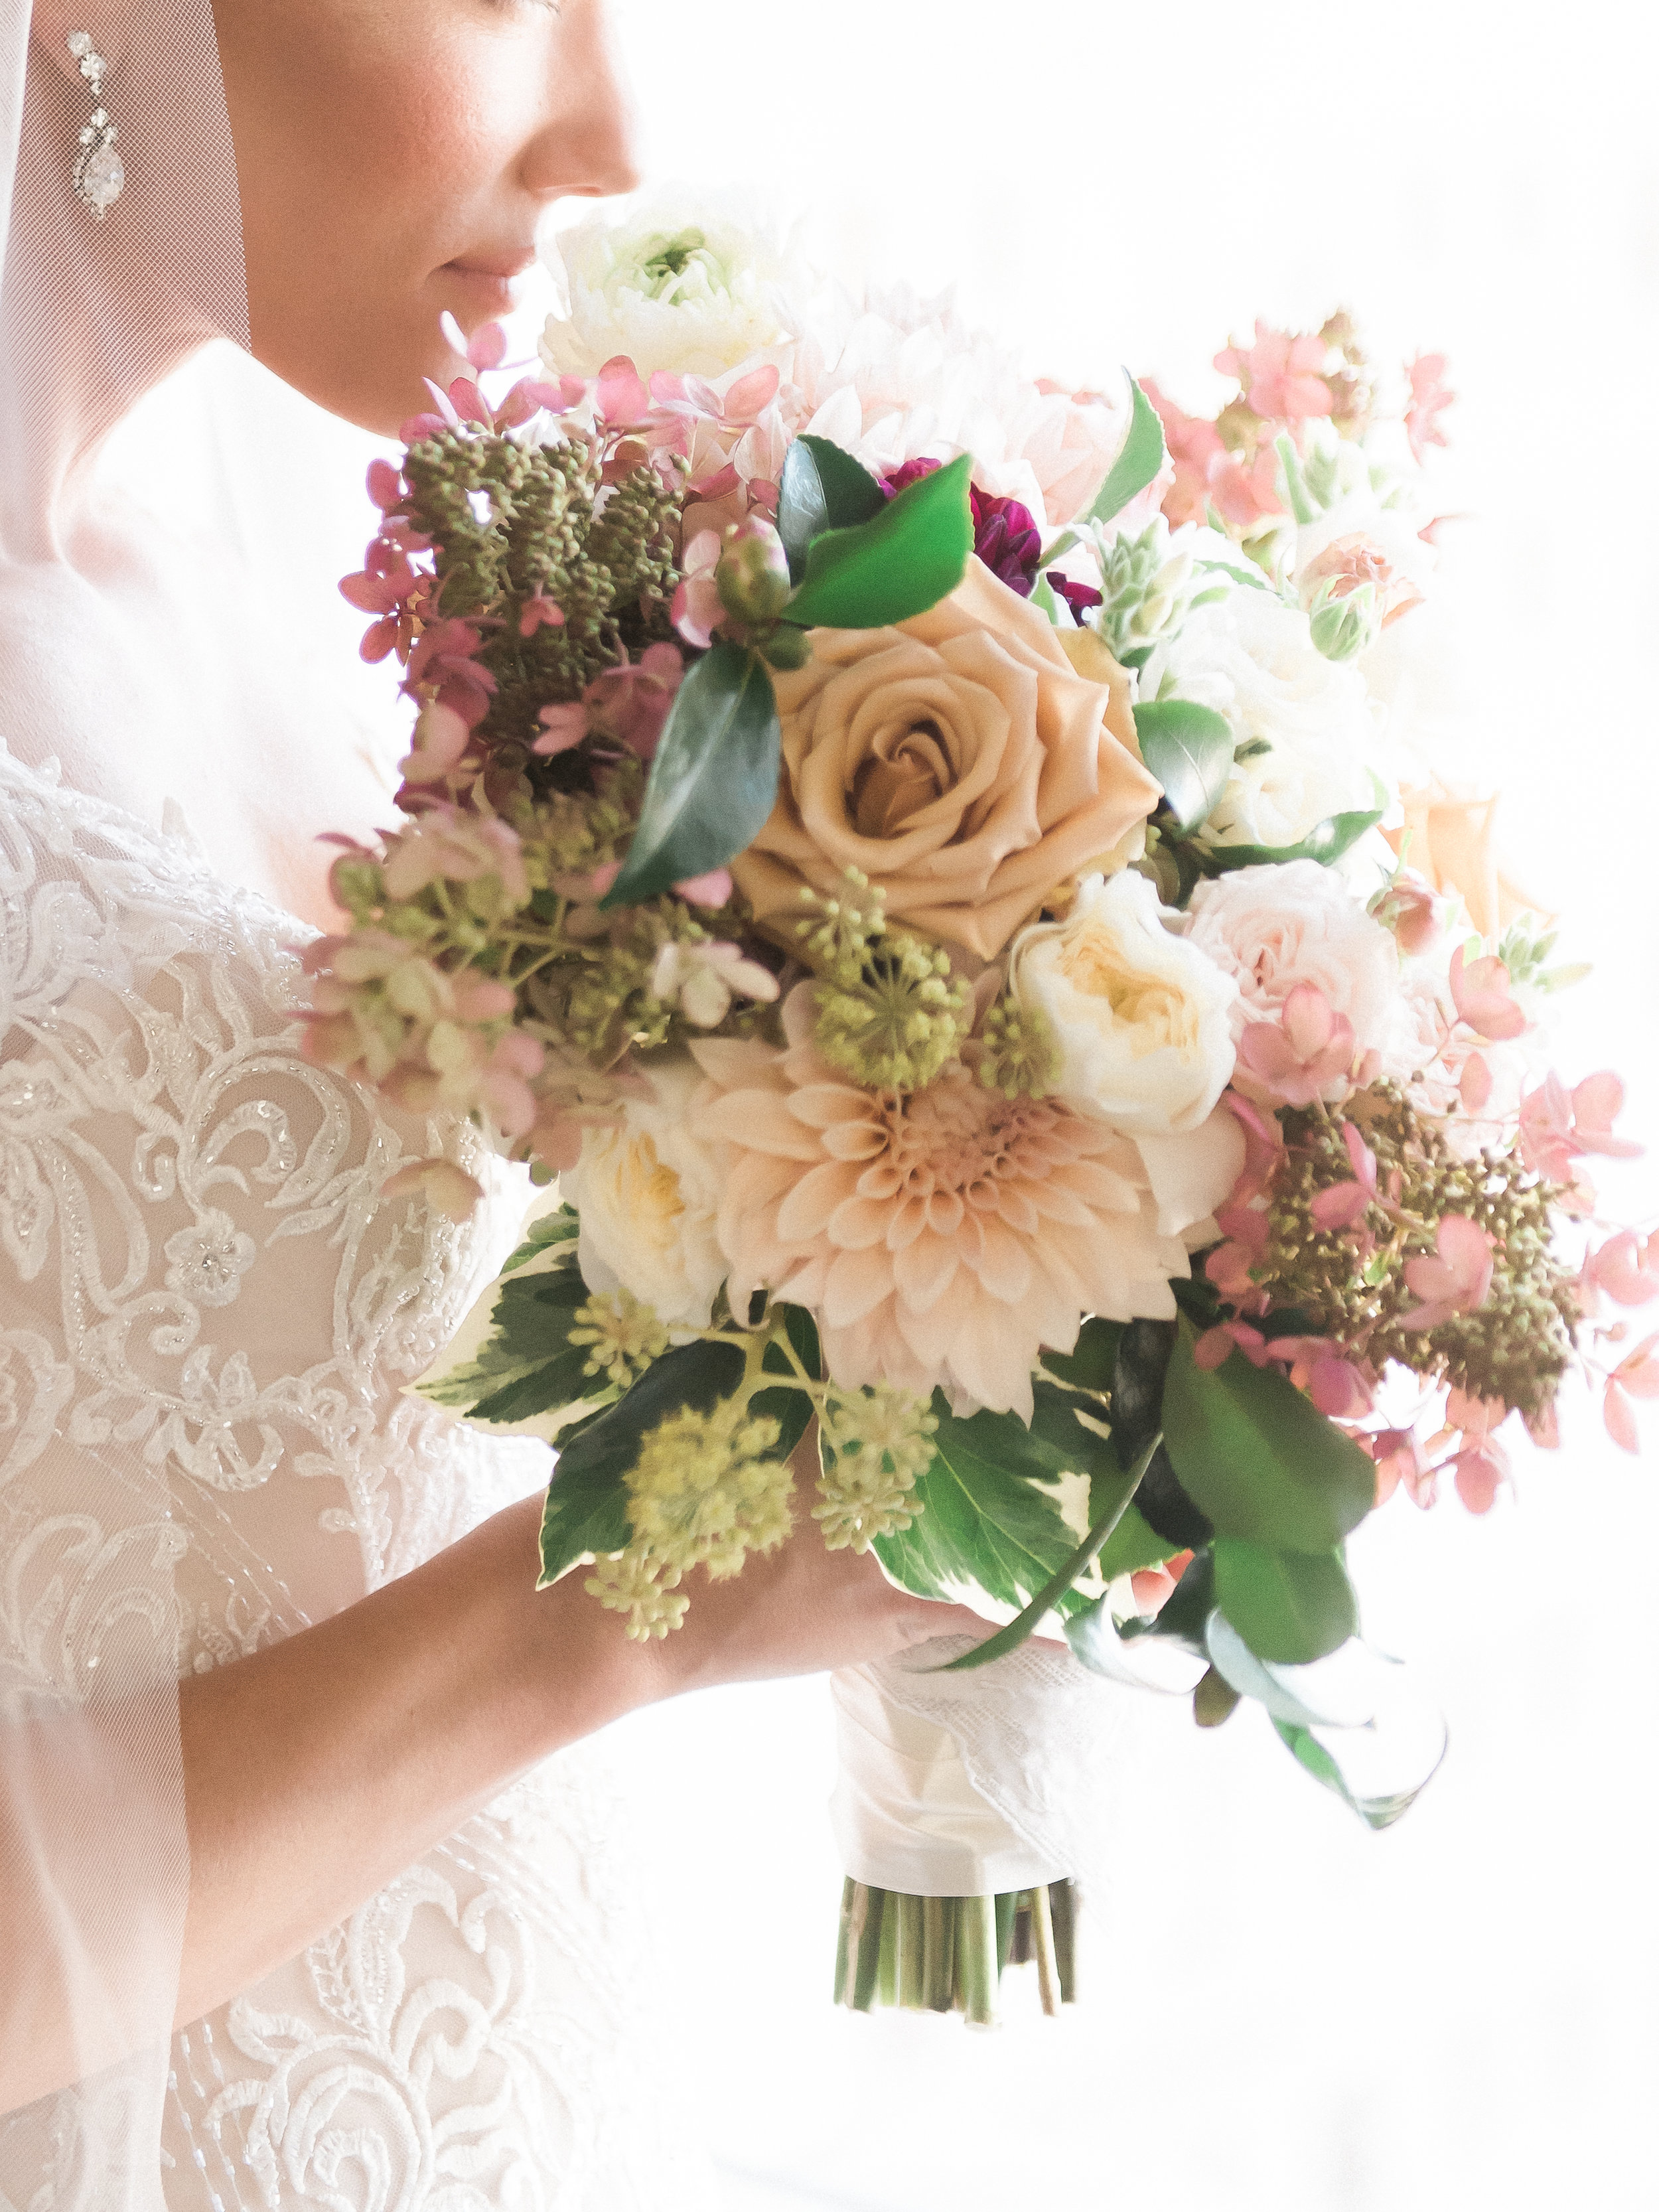 Katie+Nick_wedding_spp-blog-26.jpg